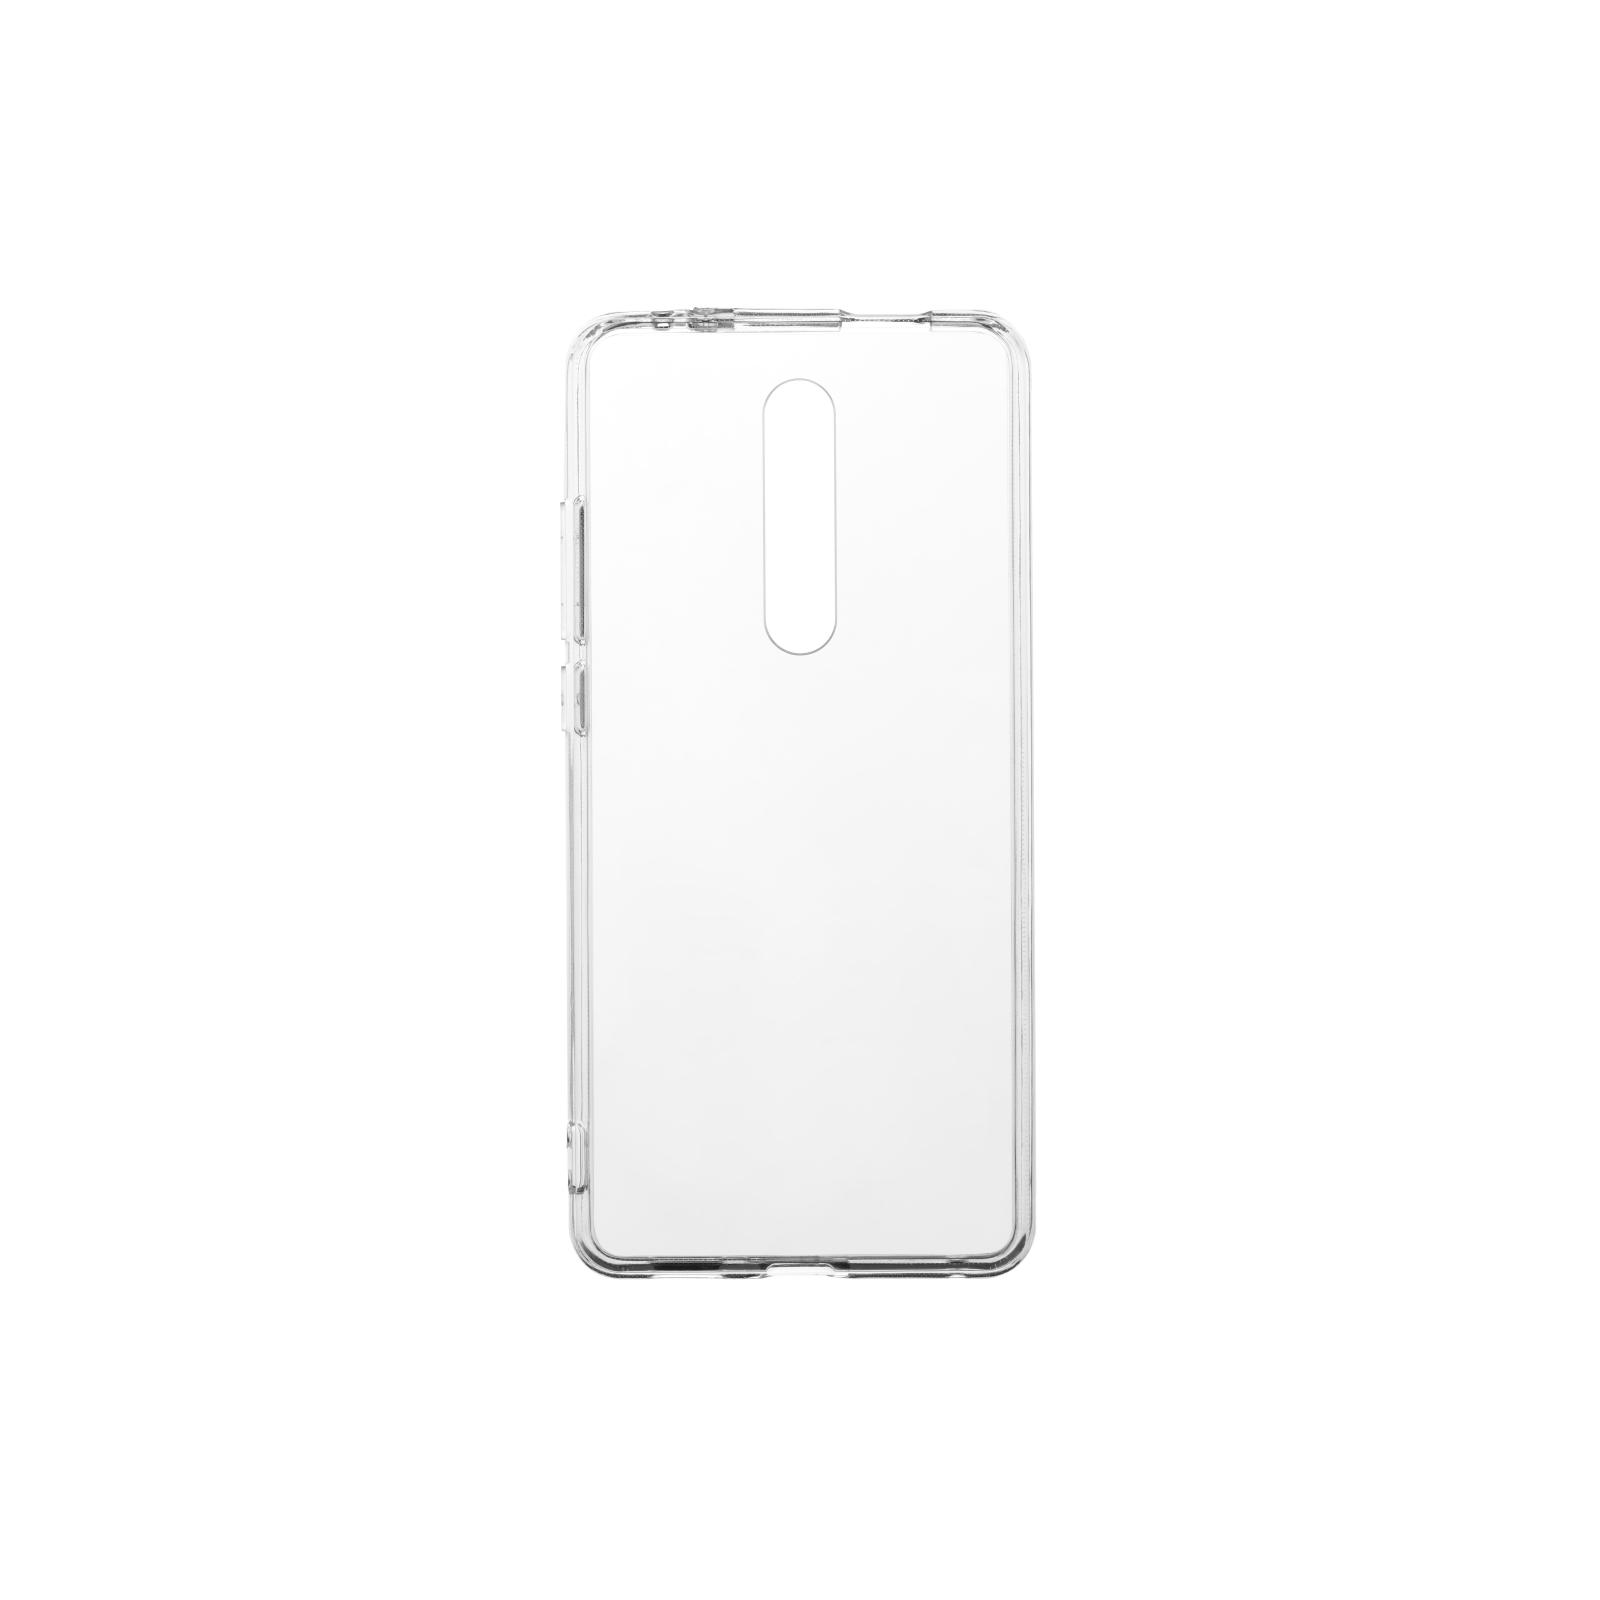 Чехол для моб. телефона 2E Xiaomi Mi 9T/K20/K20 PRO, Hybrid, Transparent (2E-MI-MI9T-AOHB-TR)